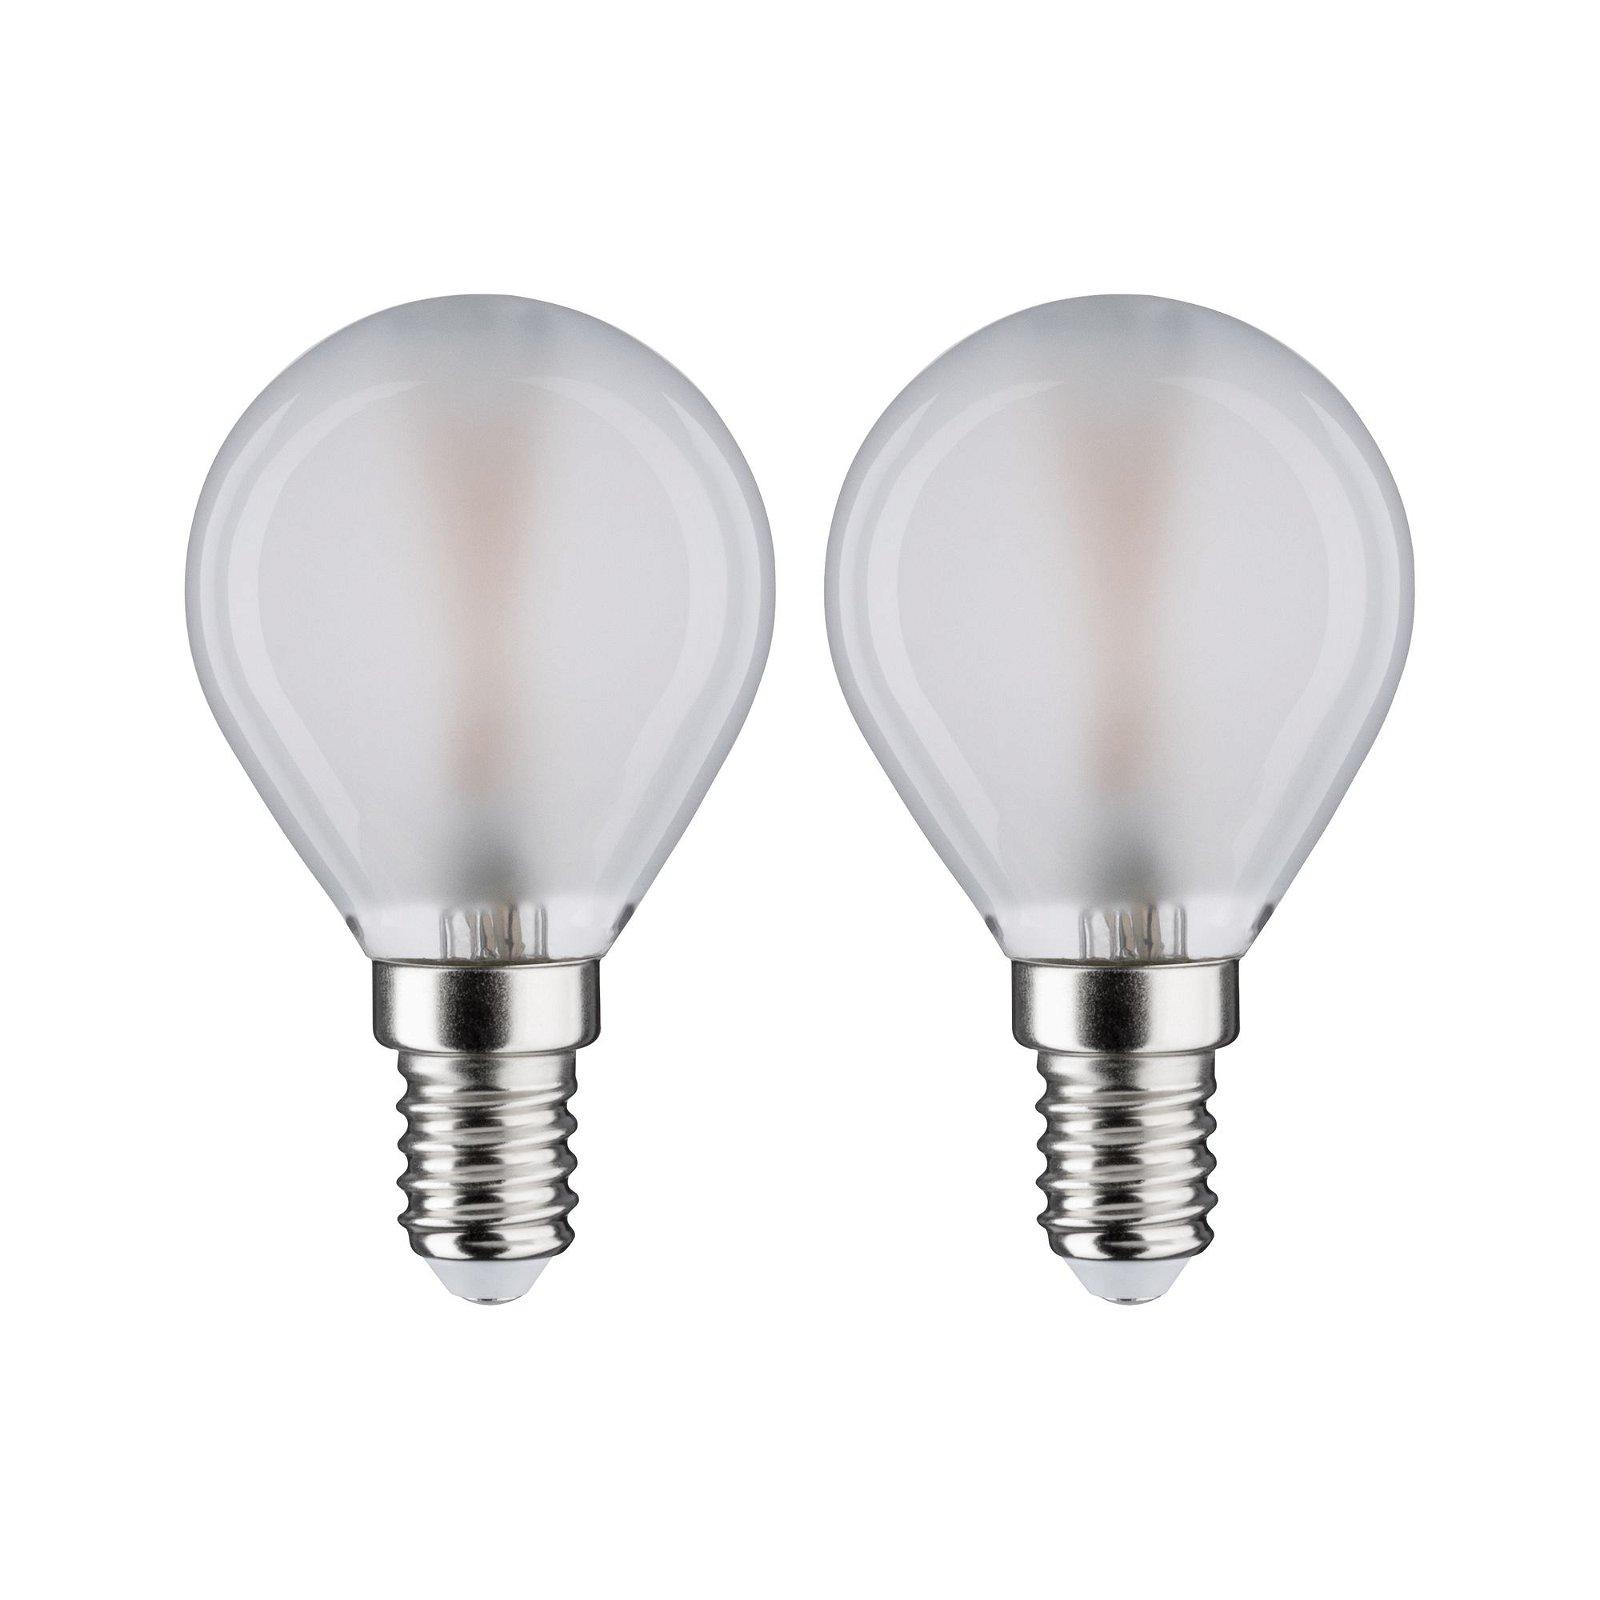 LED Tropfen Filament E14 230V 2x250lm 2x3W 2700K Matt